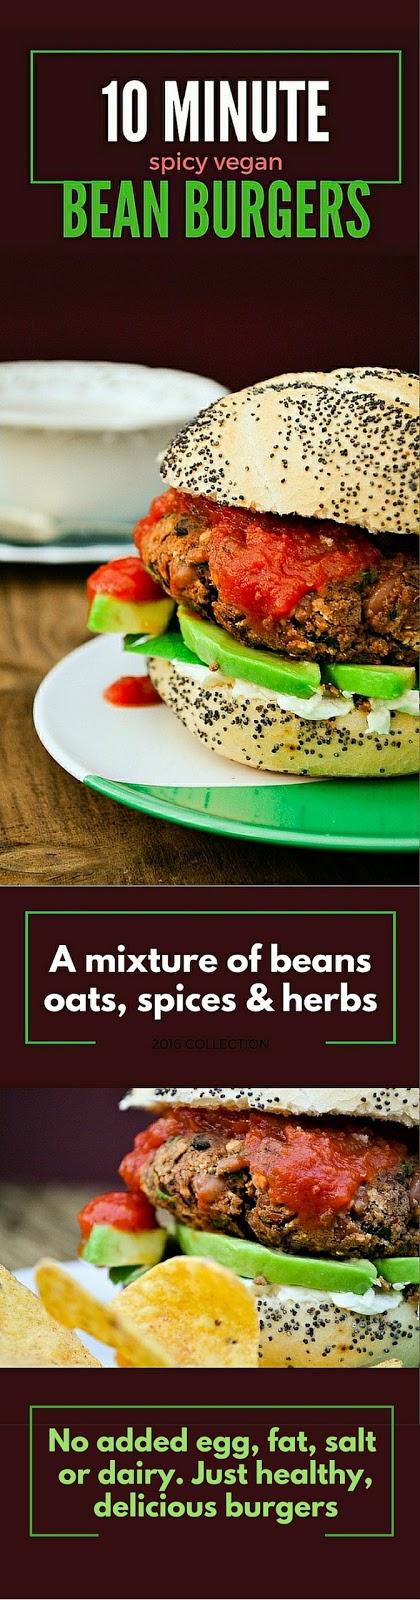 10 Minute Spicy Vegan Bean Burgers